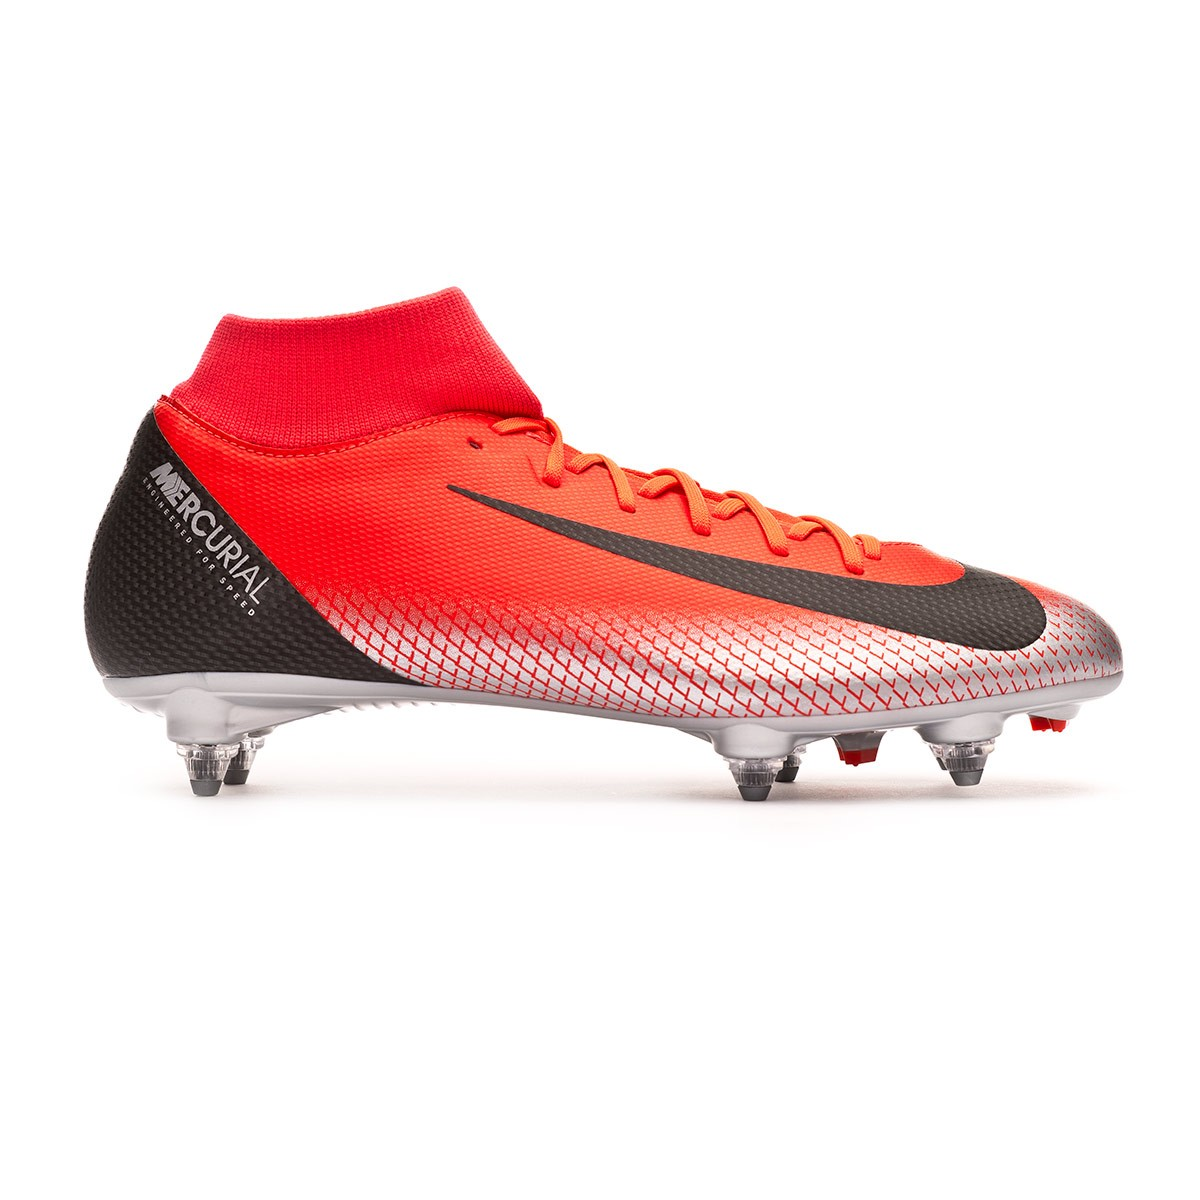 8c3220031 Football Boots Nike Mercurial Superfly VI Academy CR7 SG-Pro Bright crimson- Black-Chrome-Dark grey - Tienda de fútbol Fútbol Emotion